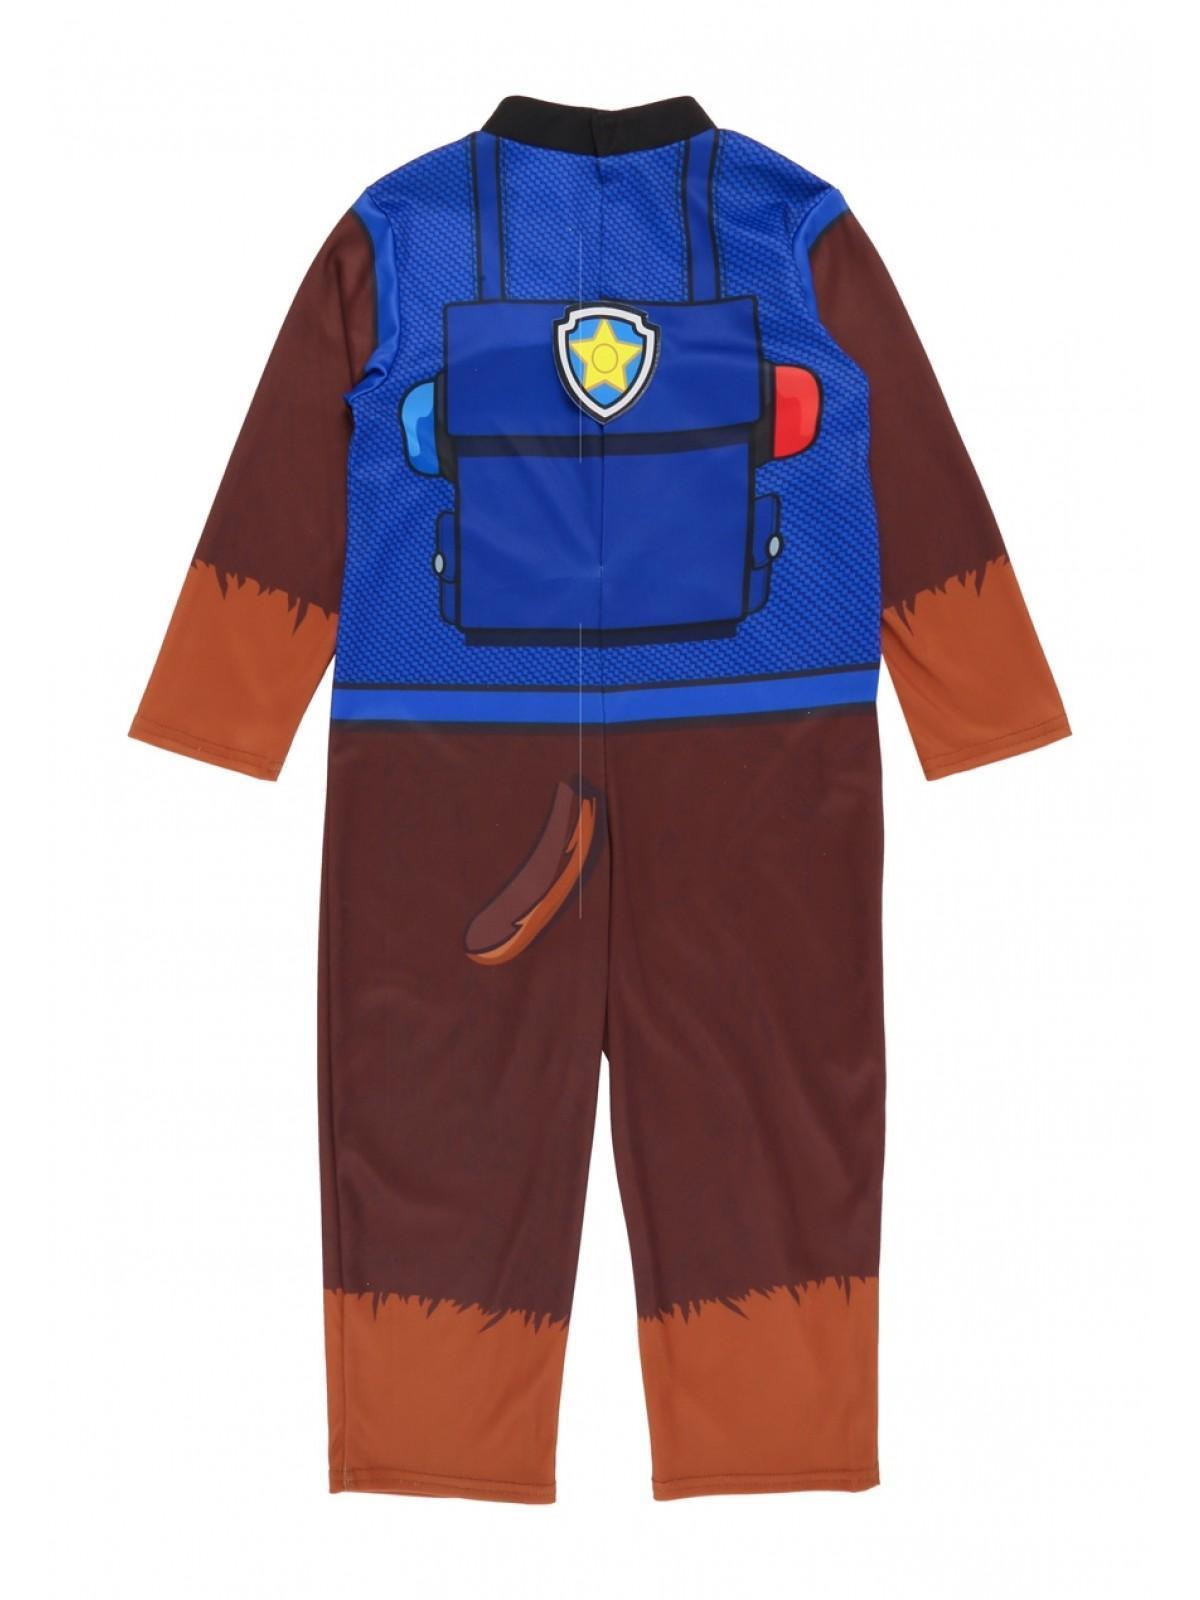 Kids Paw Patrol Fancy Dress Outfit